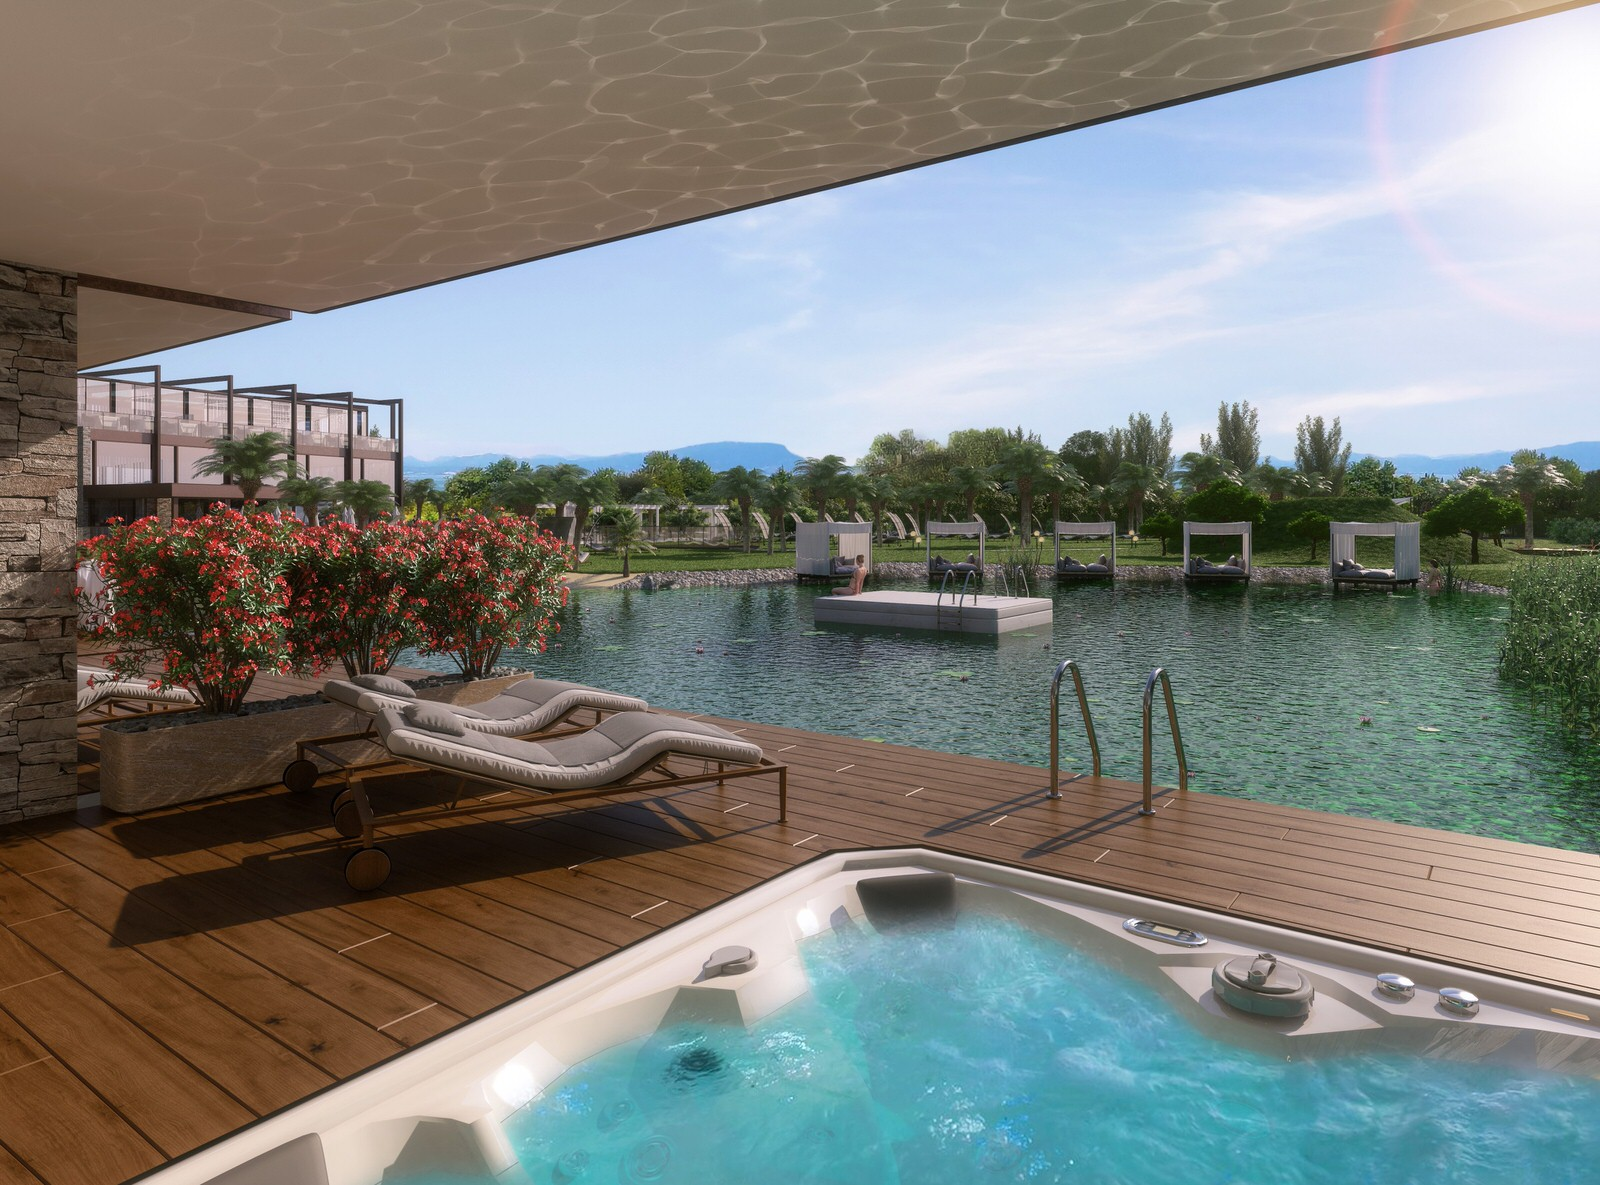 Quellenhof Terrasse Giardino al Lago Luxury-Resort Lazise